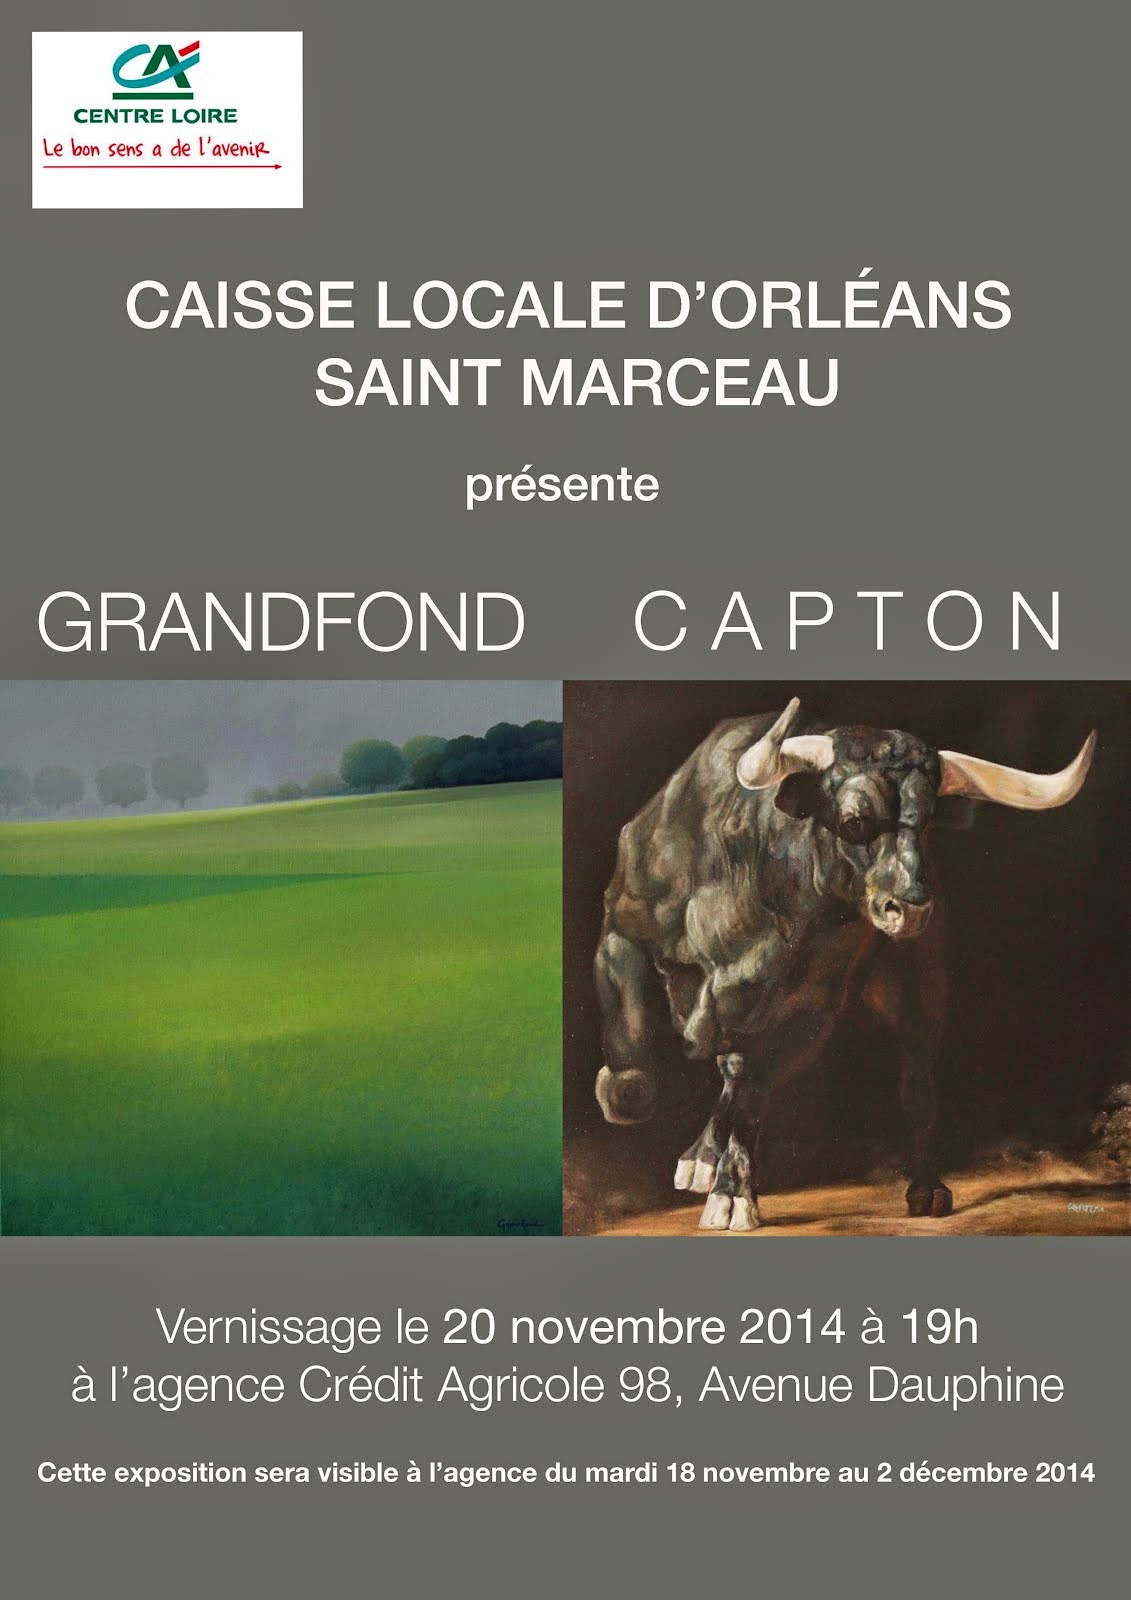 ORLÉANS : CAPTON ET GRANDFOND EXPOSENT ENSEMBLE